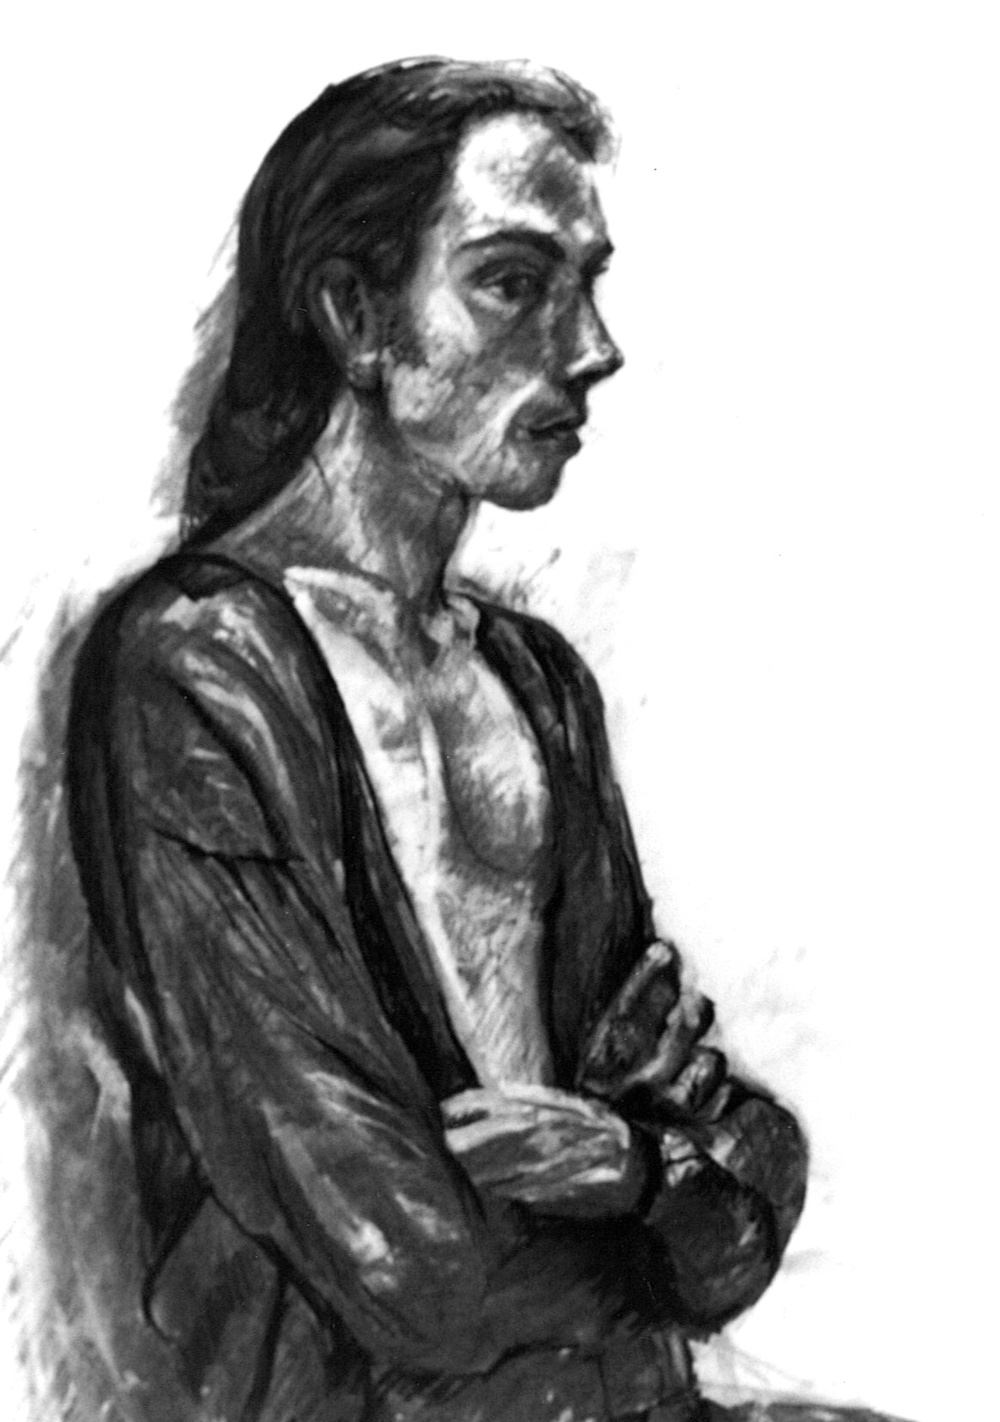 male figure study.jpg